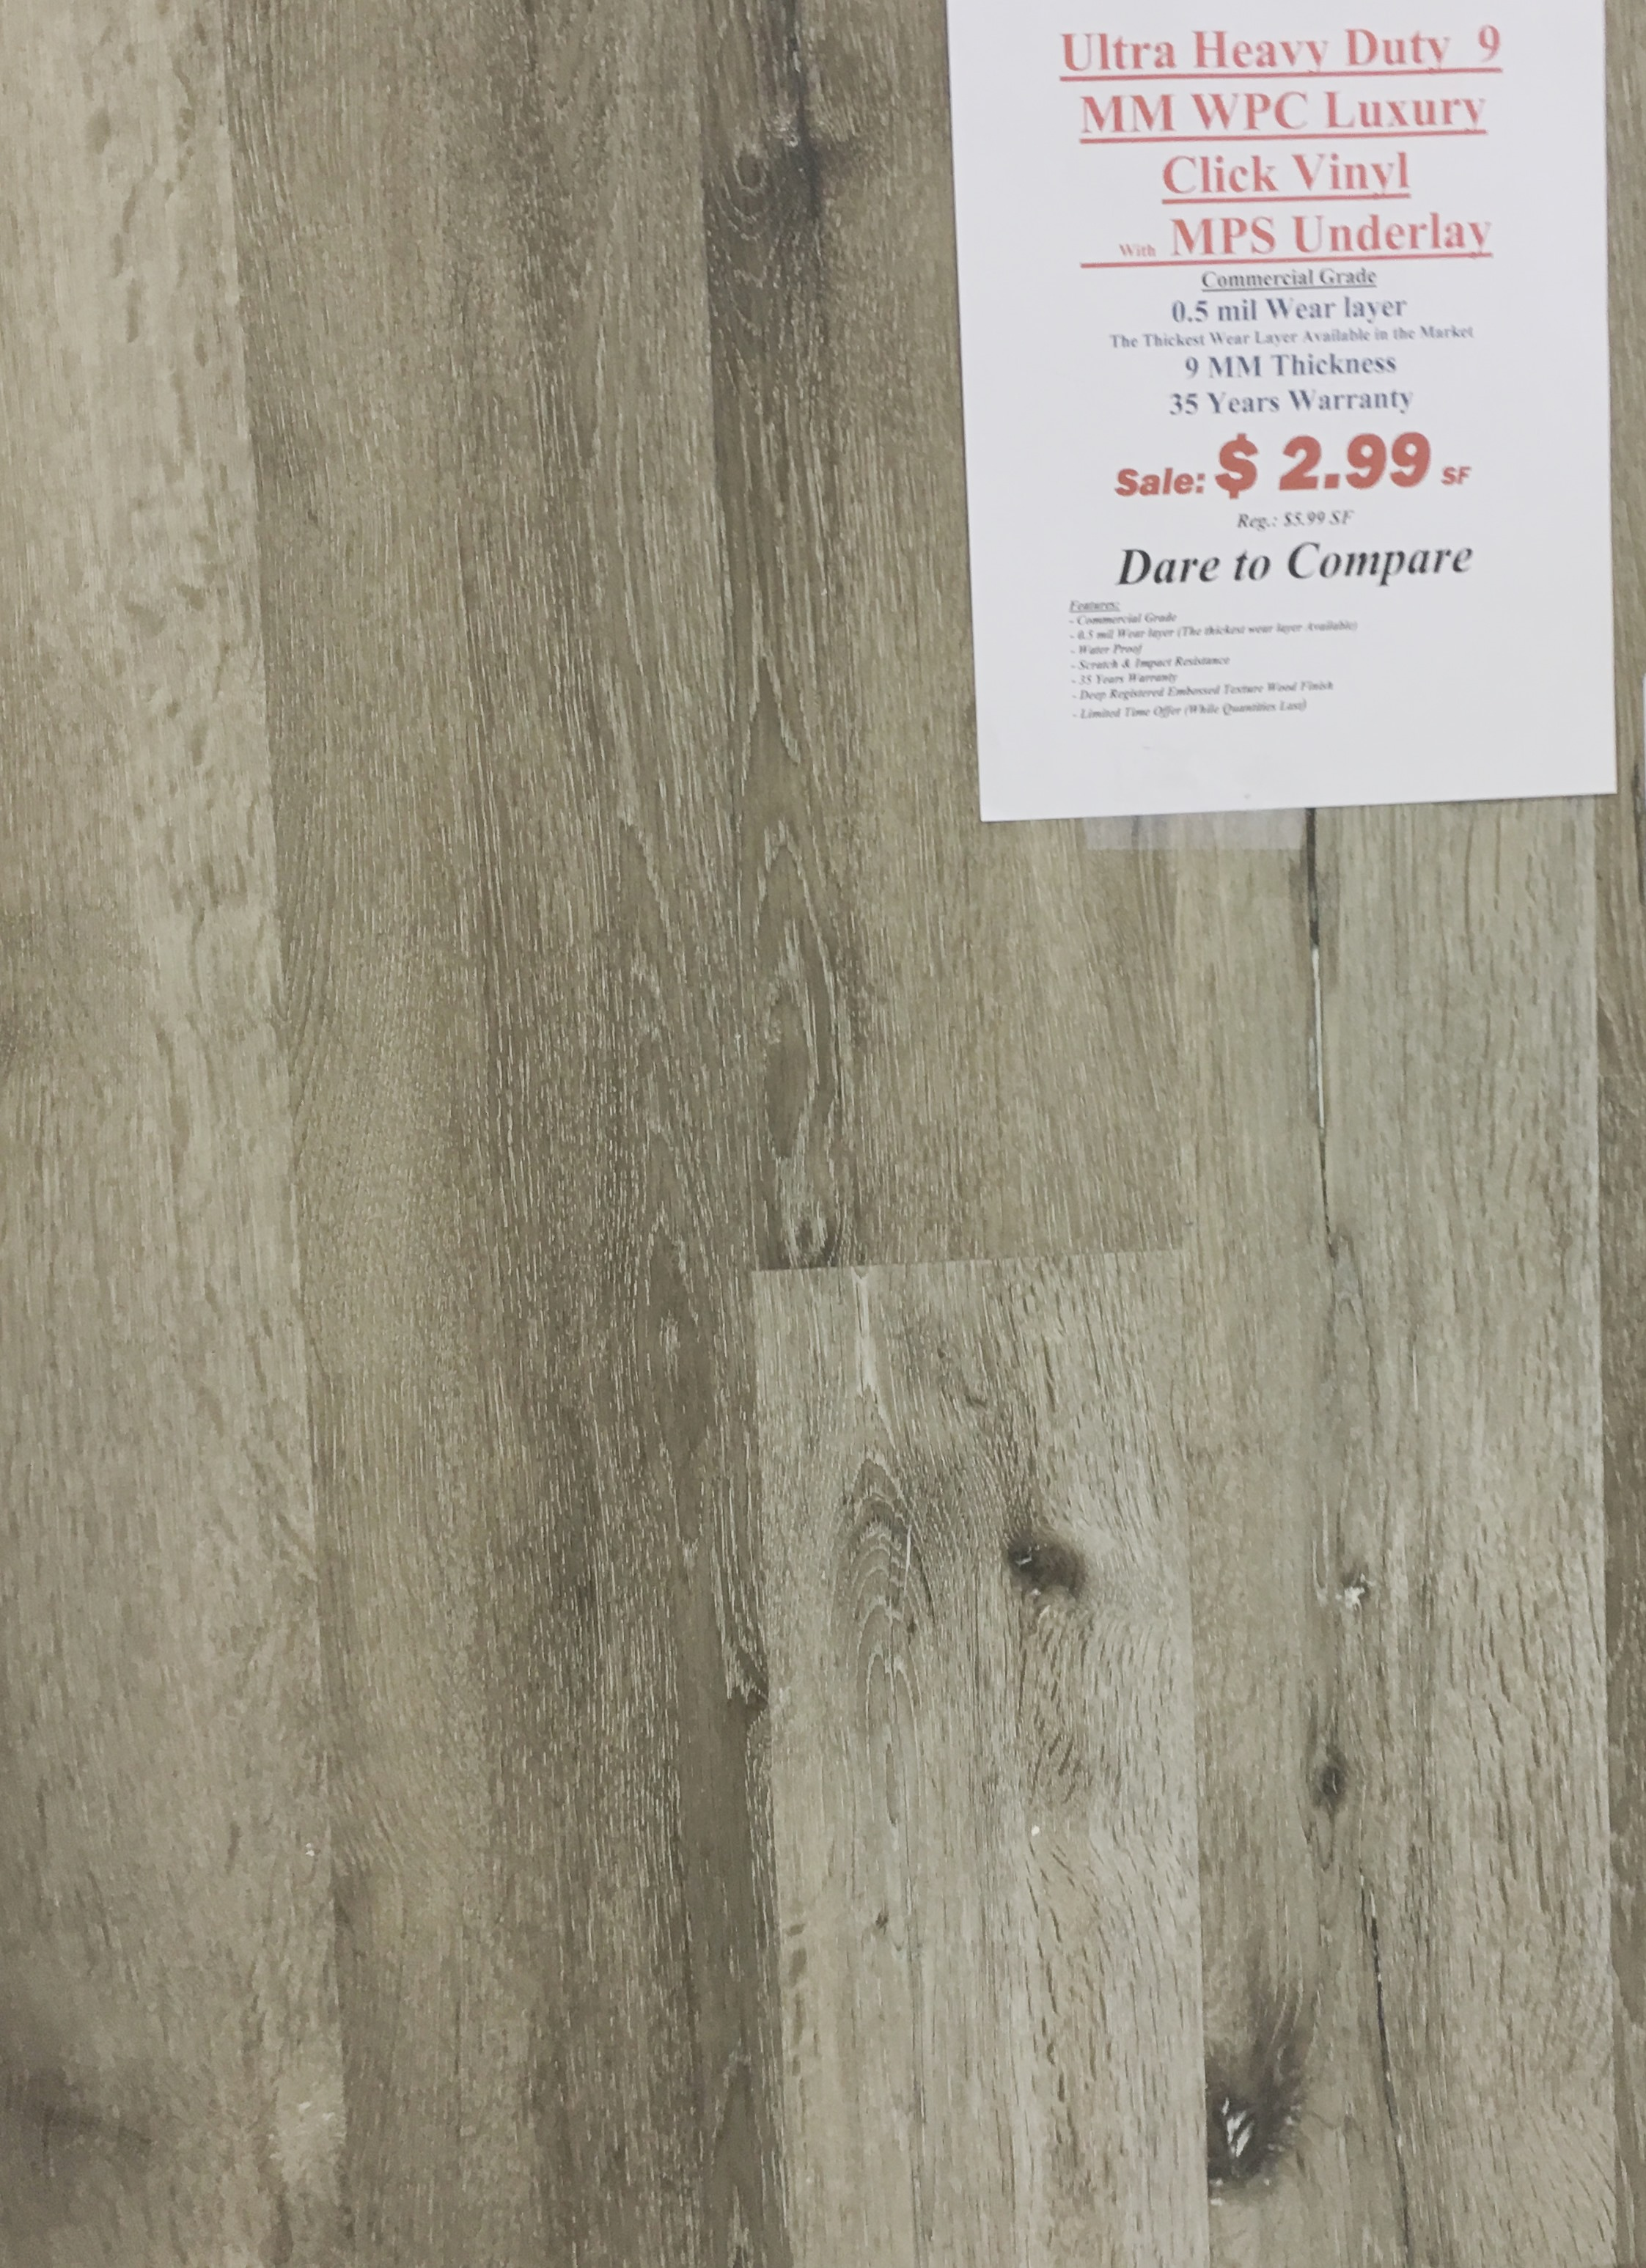 Wpc luxury vinyl mm w mps underlay canada flooring rugs